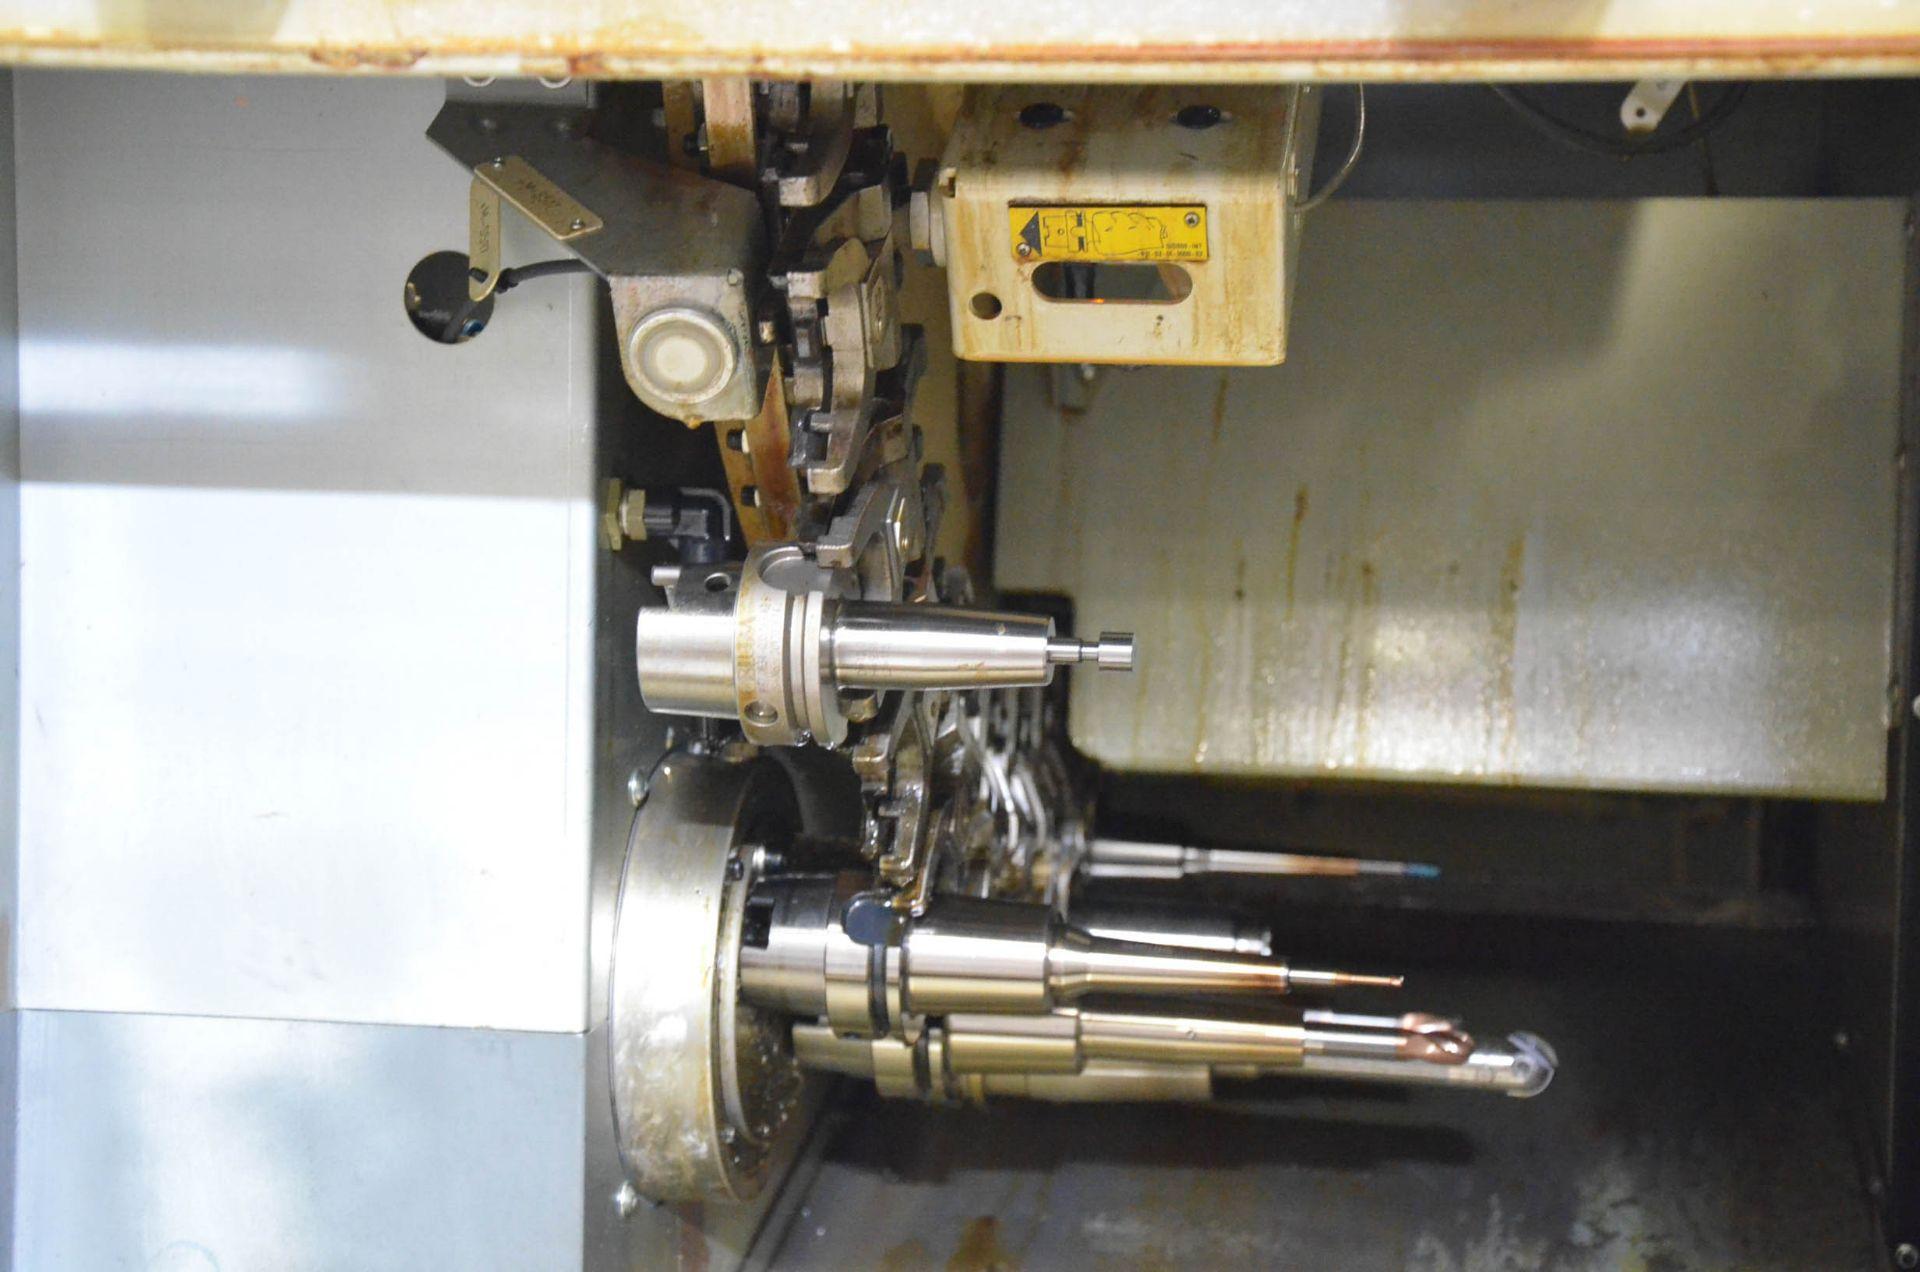 "GROB (2012) G350 5-AXIS CNC MACHINING CENTER WITH HEIDENHAIN ITNC 530 CNC CONTROL, 22.25"" DIAMETER - Image 12 of 12"